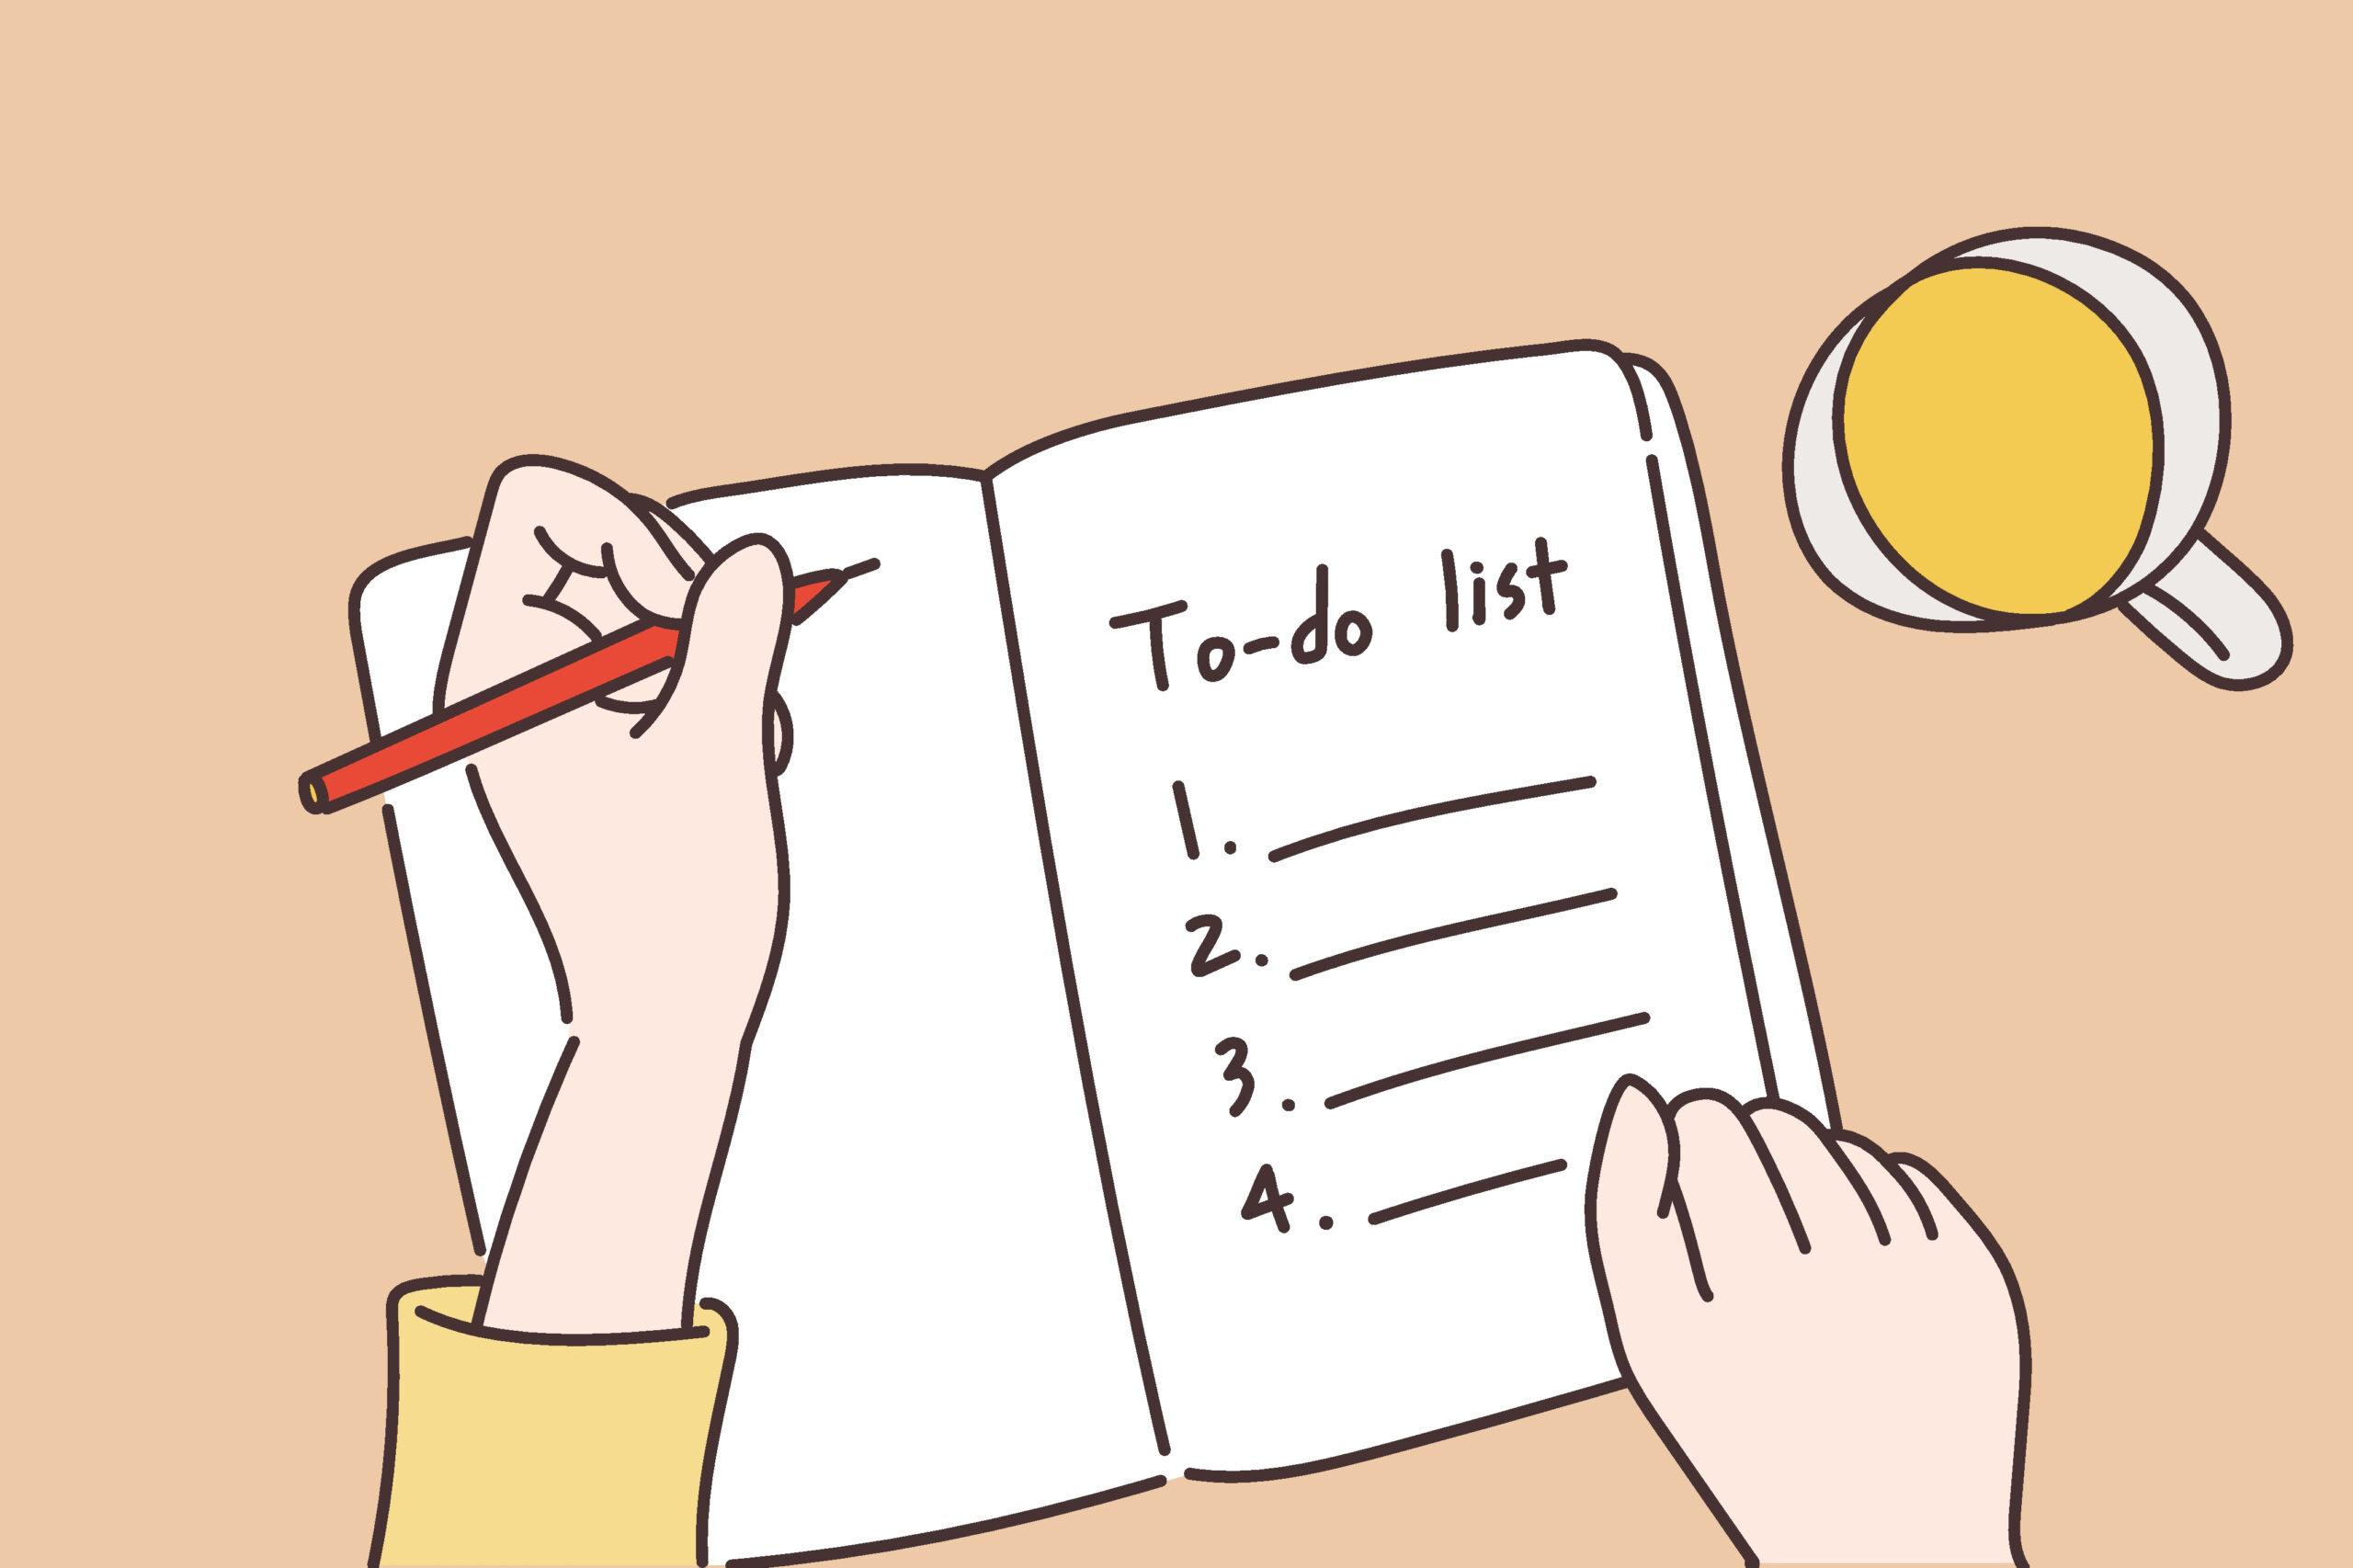 Break down your goals into tasks. Image source: Shutterstock